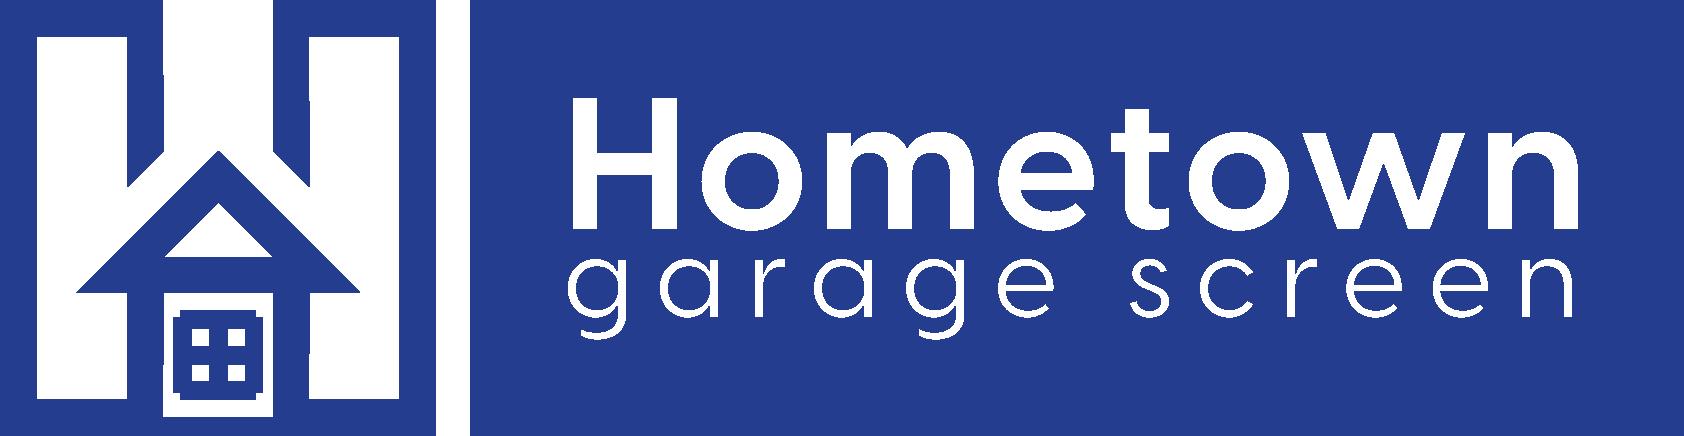 Hometown garage screen logo